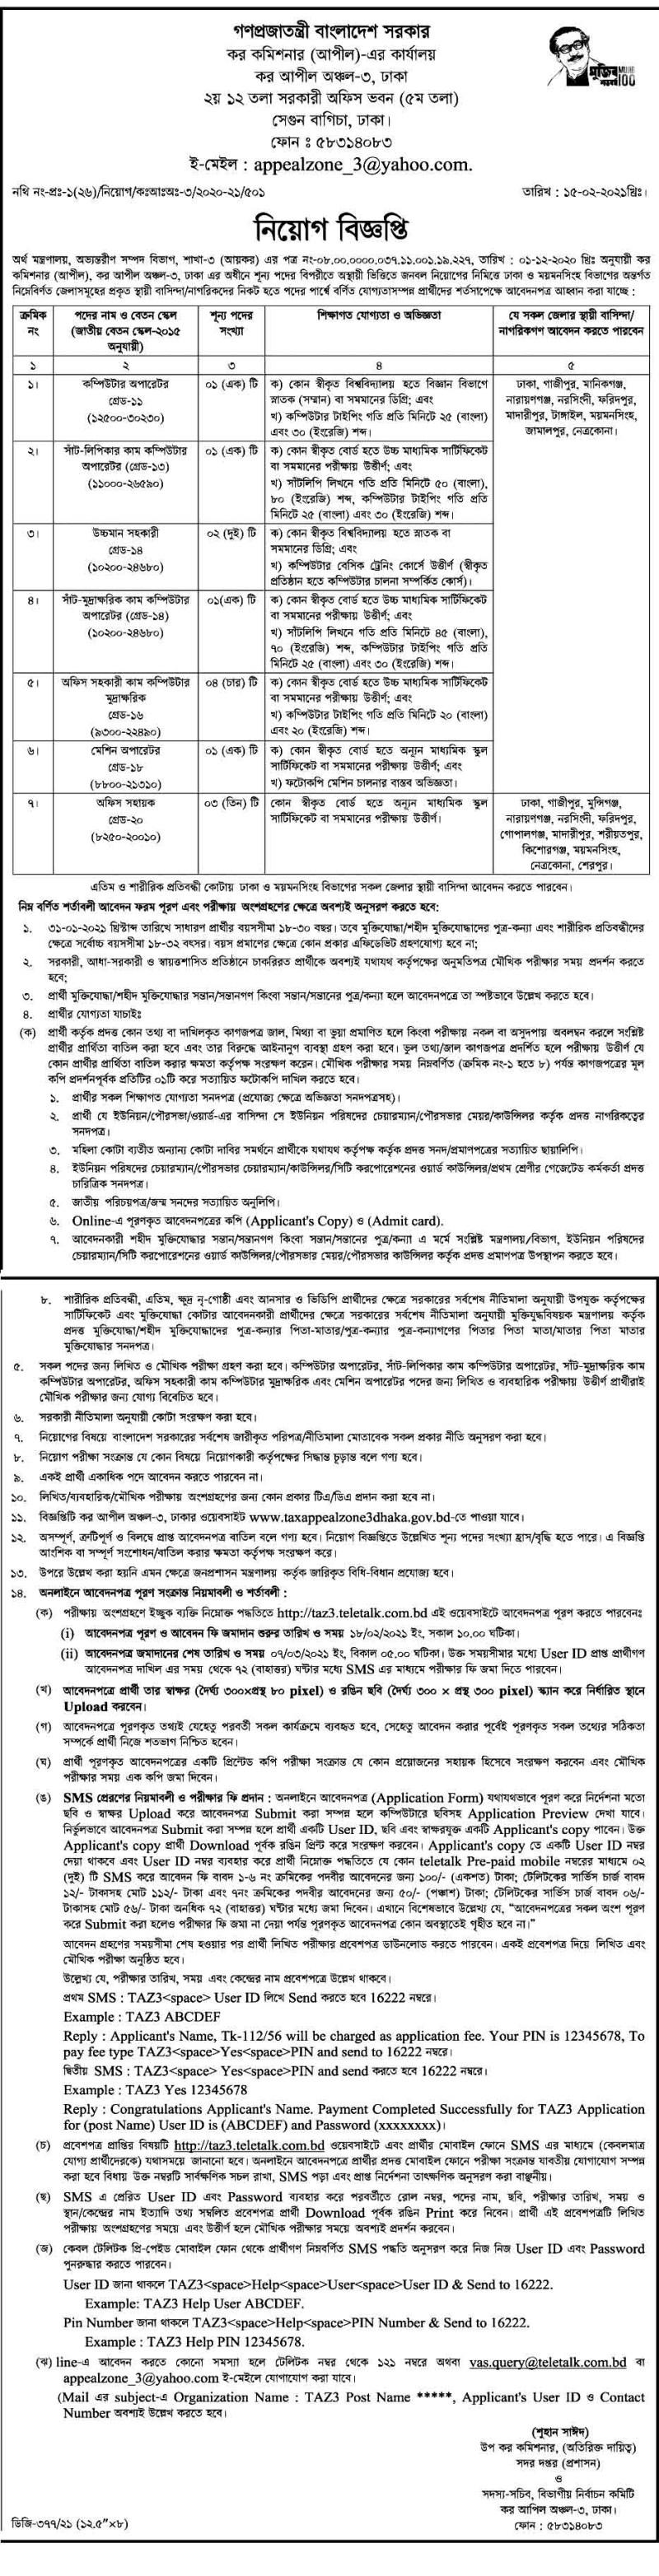 Tax Commissioner Office Job Circular 2021 (Image)